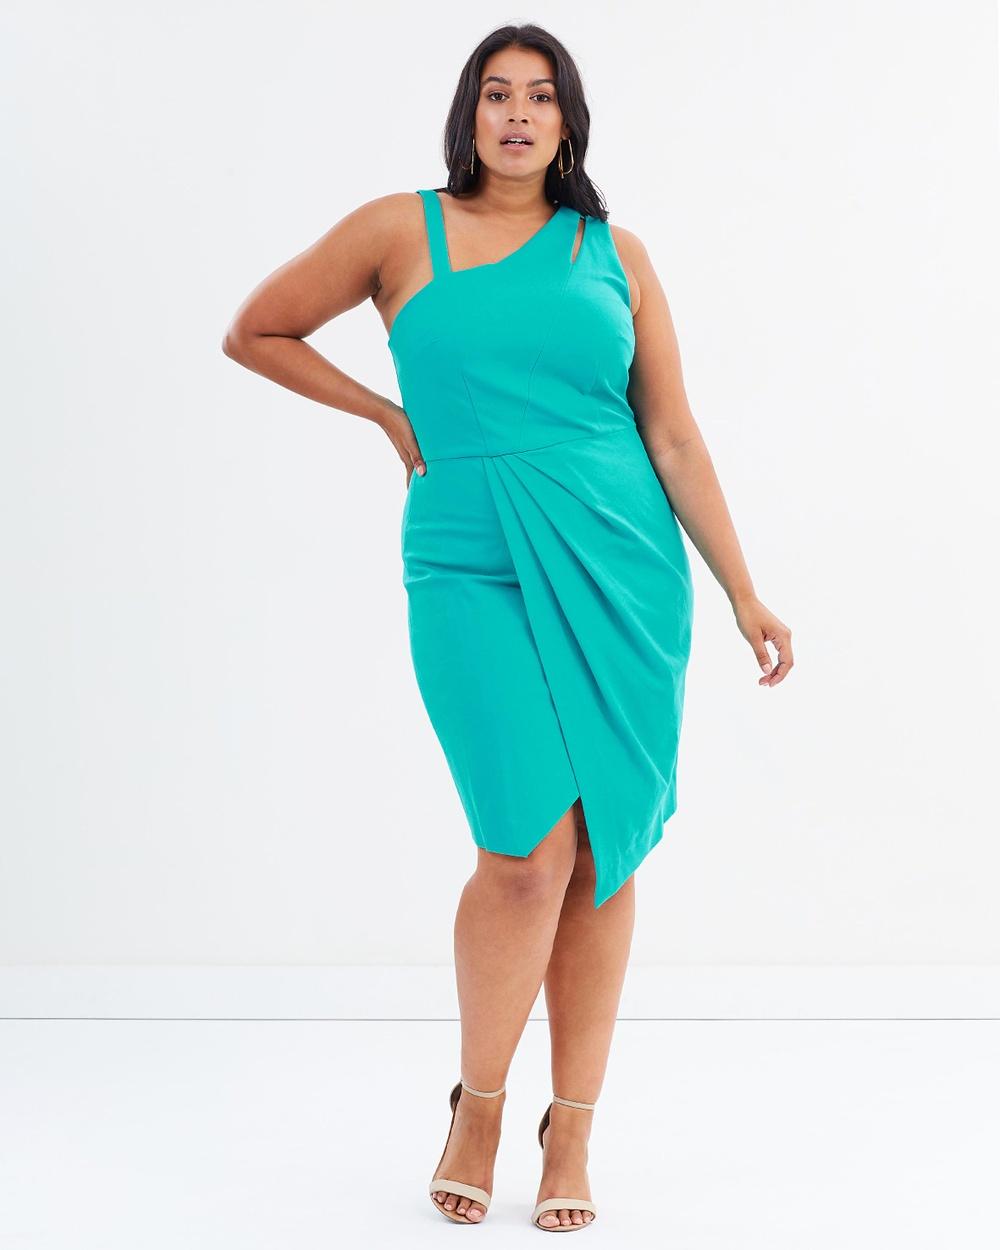 Rebel Wilson x Angels Asymmetrical Cut Out Dress Dresses Viridian Green Asymmetrical Cut-Out Dress